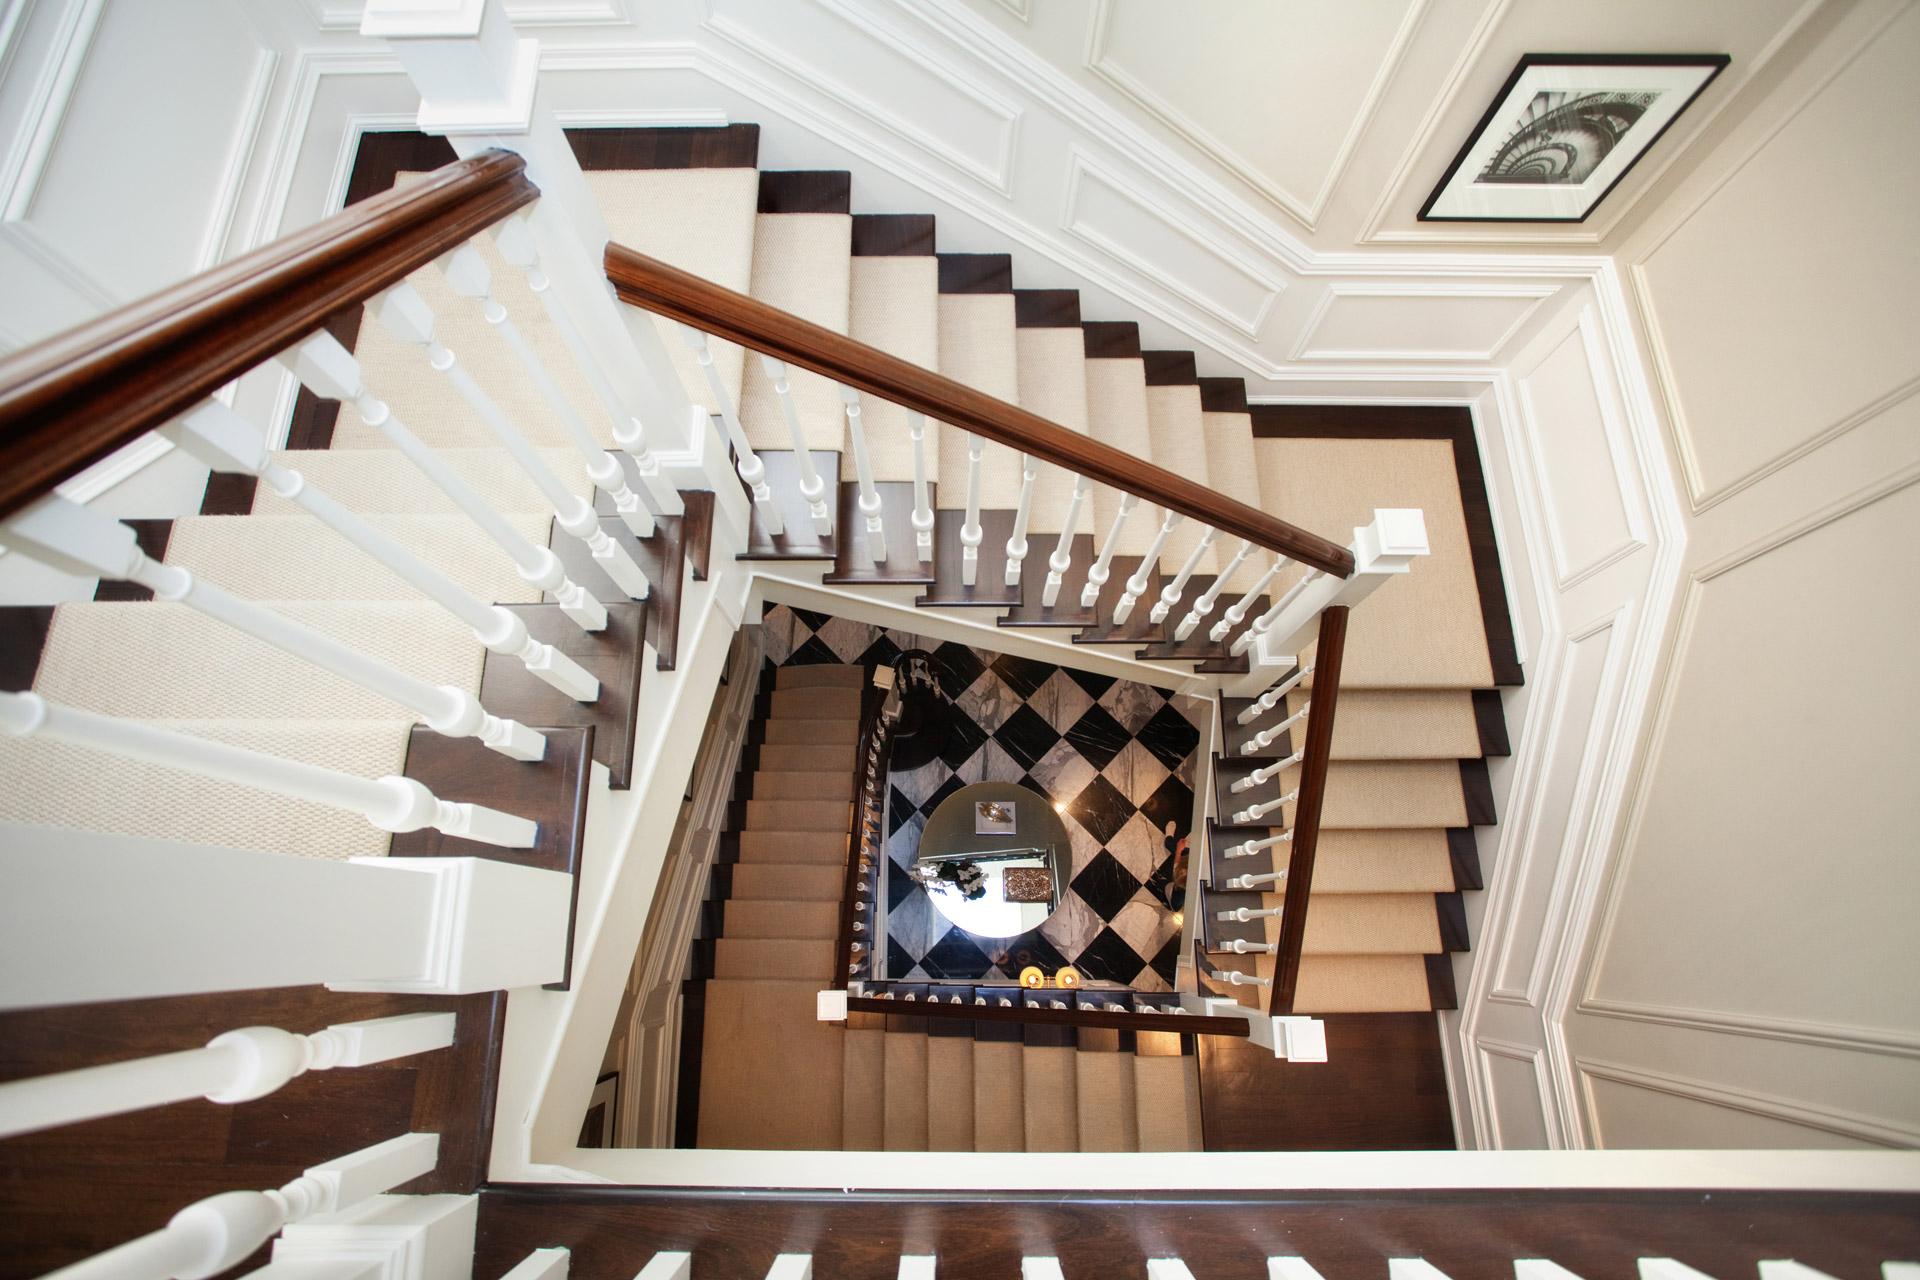 Custom millwork staircase stairs wainscotting